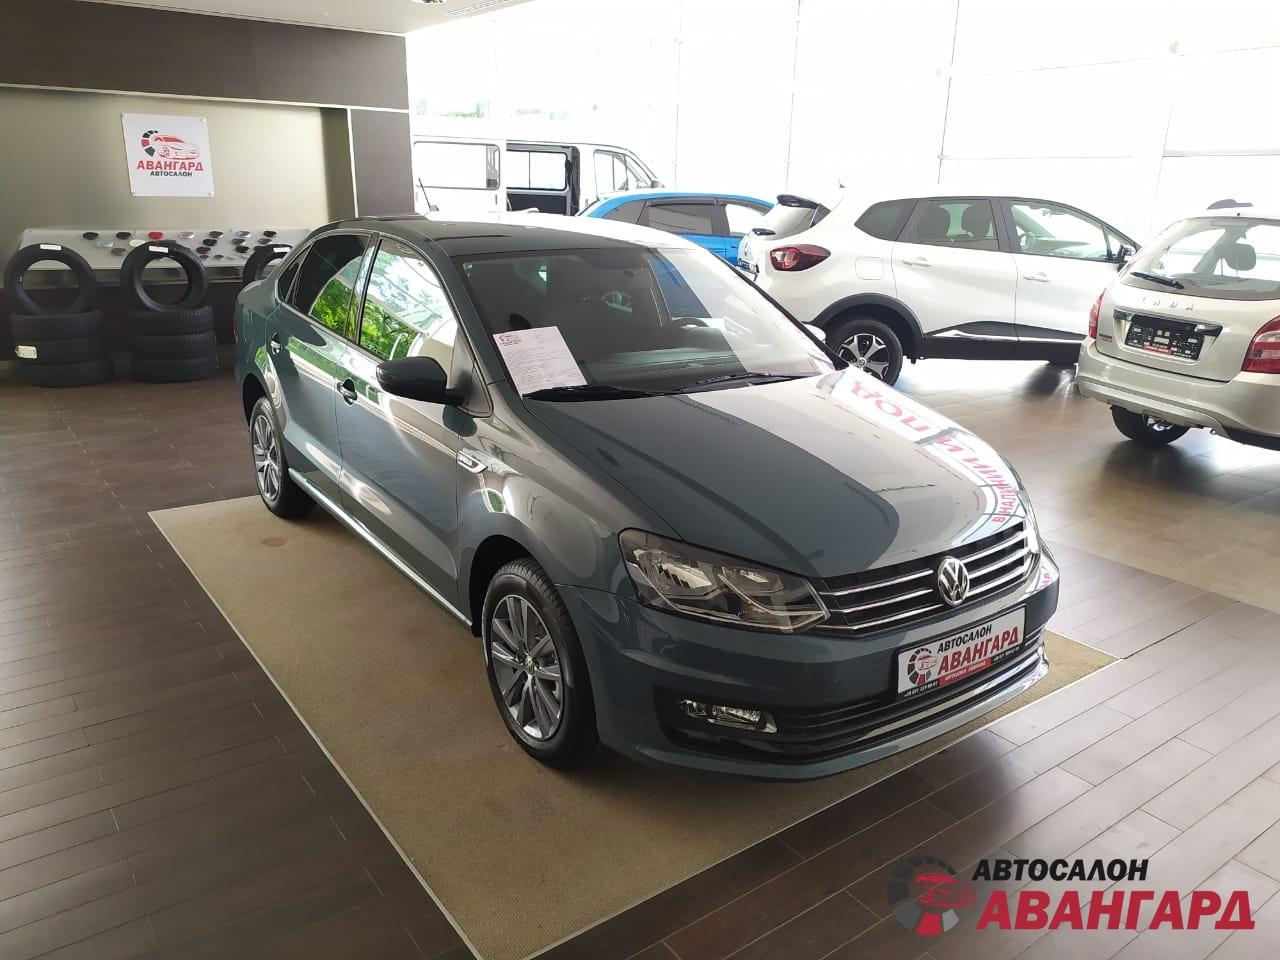 Volkswagen Polo (Фольксваген Поло) MPI 1.6 16кл. (110 л.с.) 6-АКП